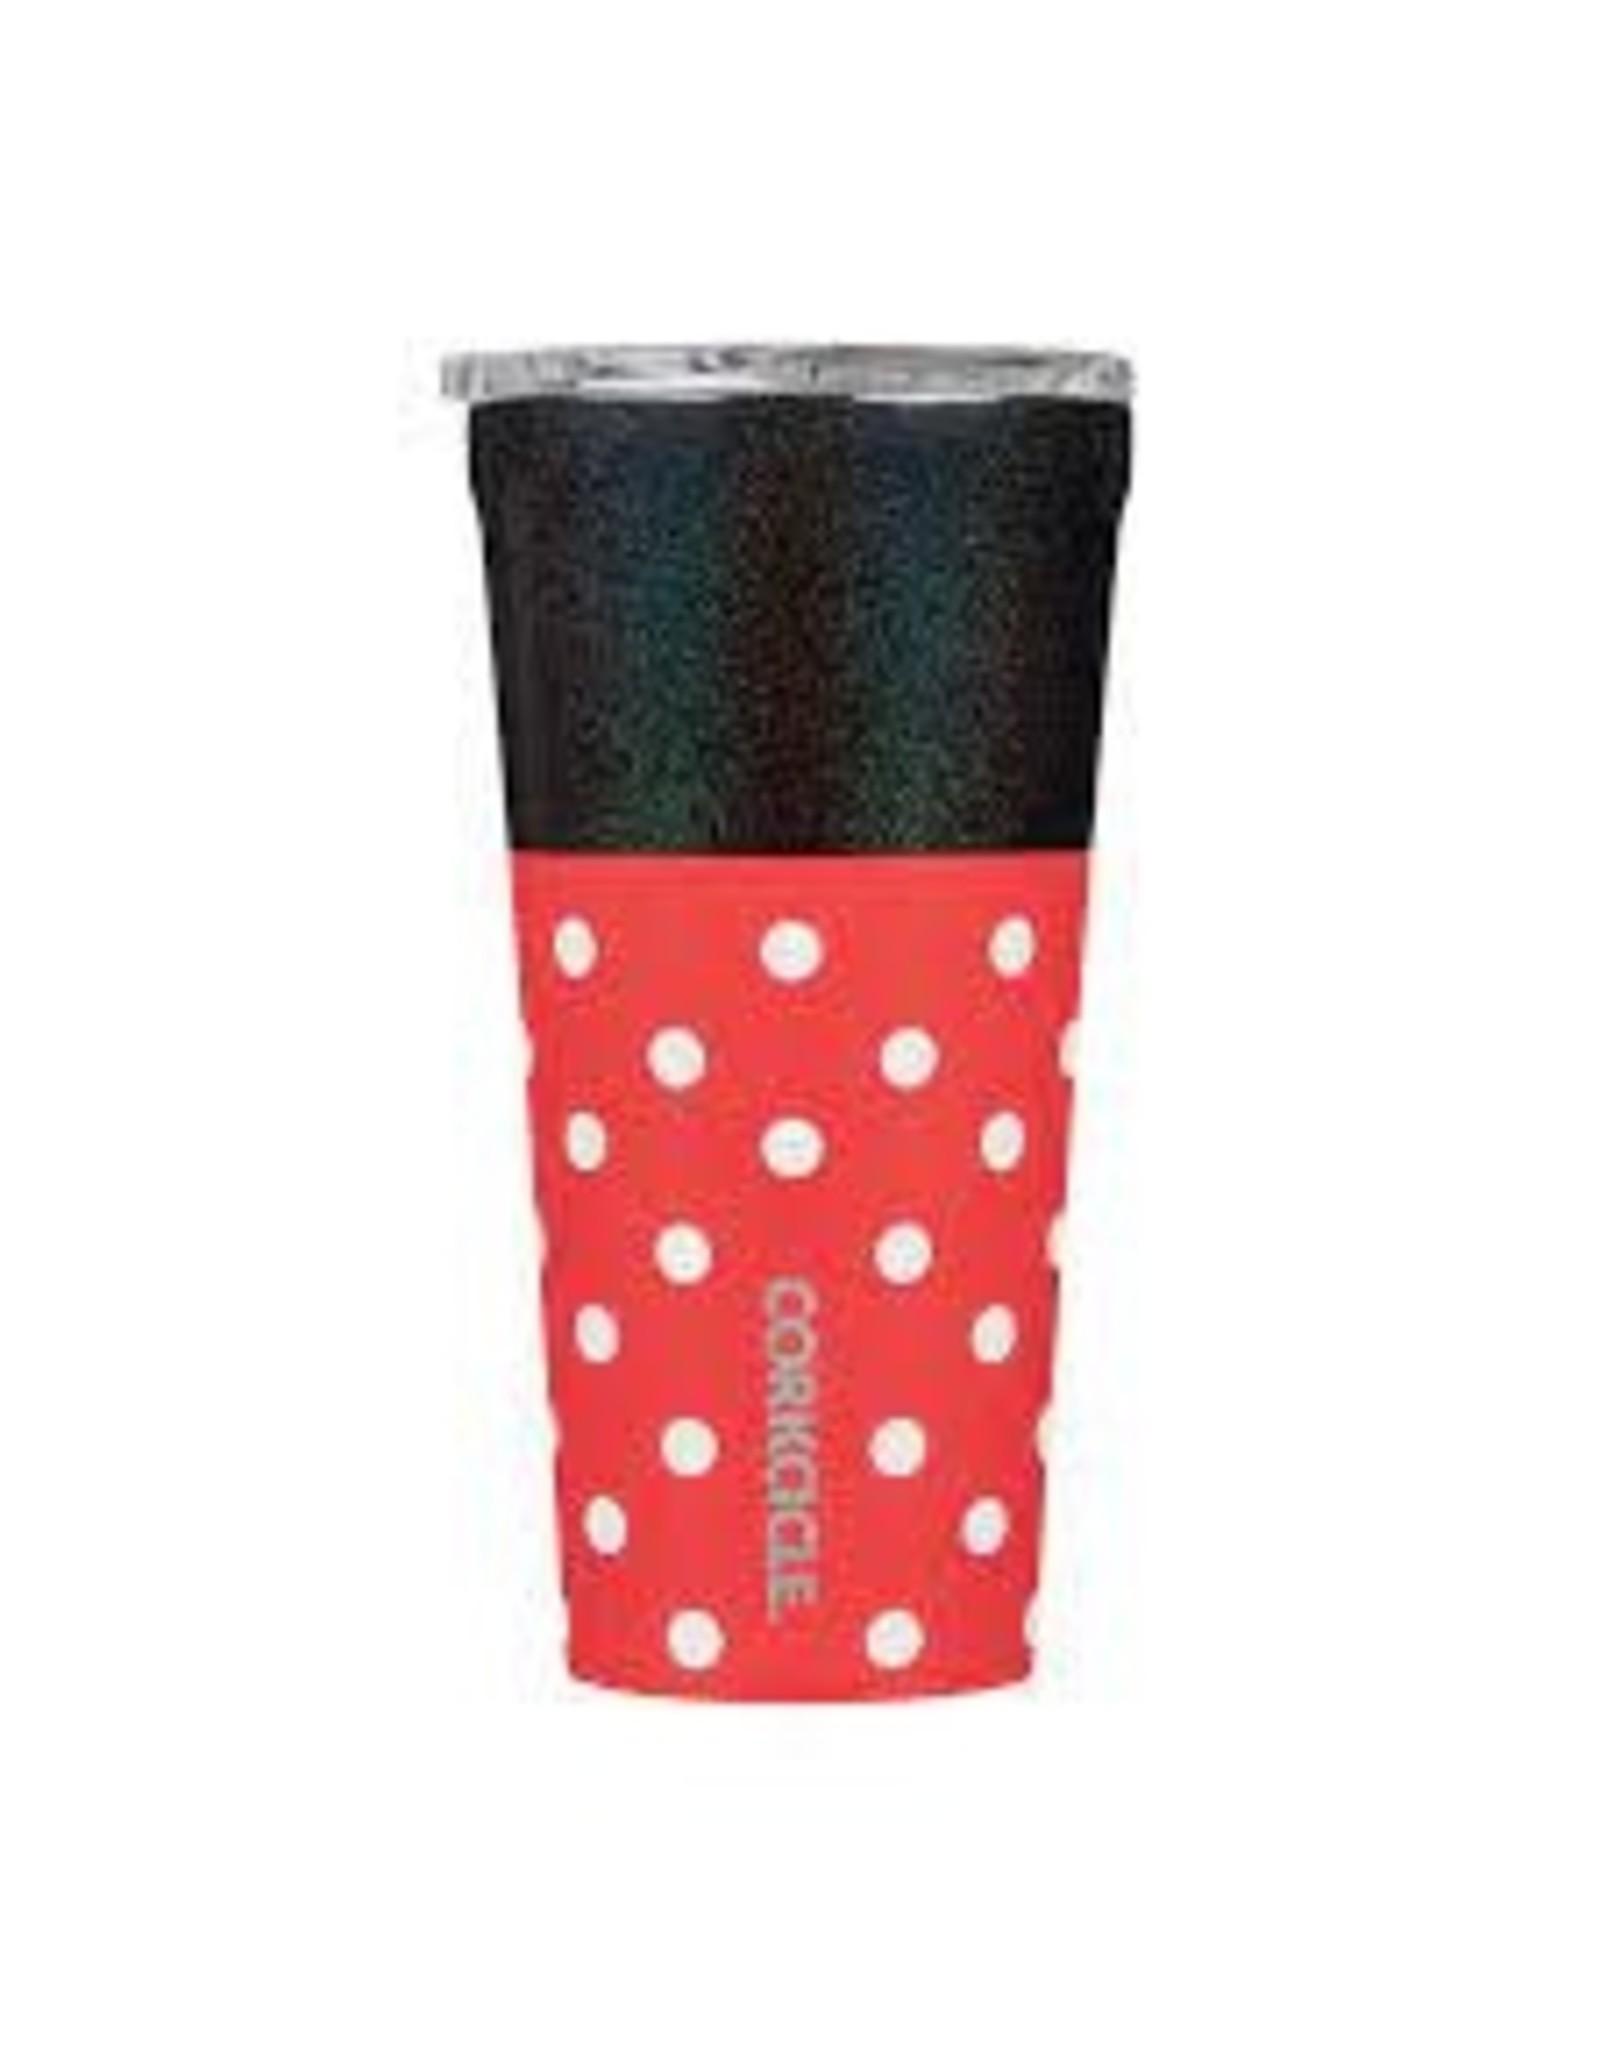 Corkcicle Corkcicle- 16oz Disney Minnie-Polka Dot Red